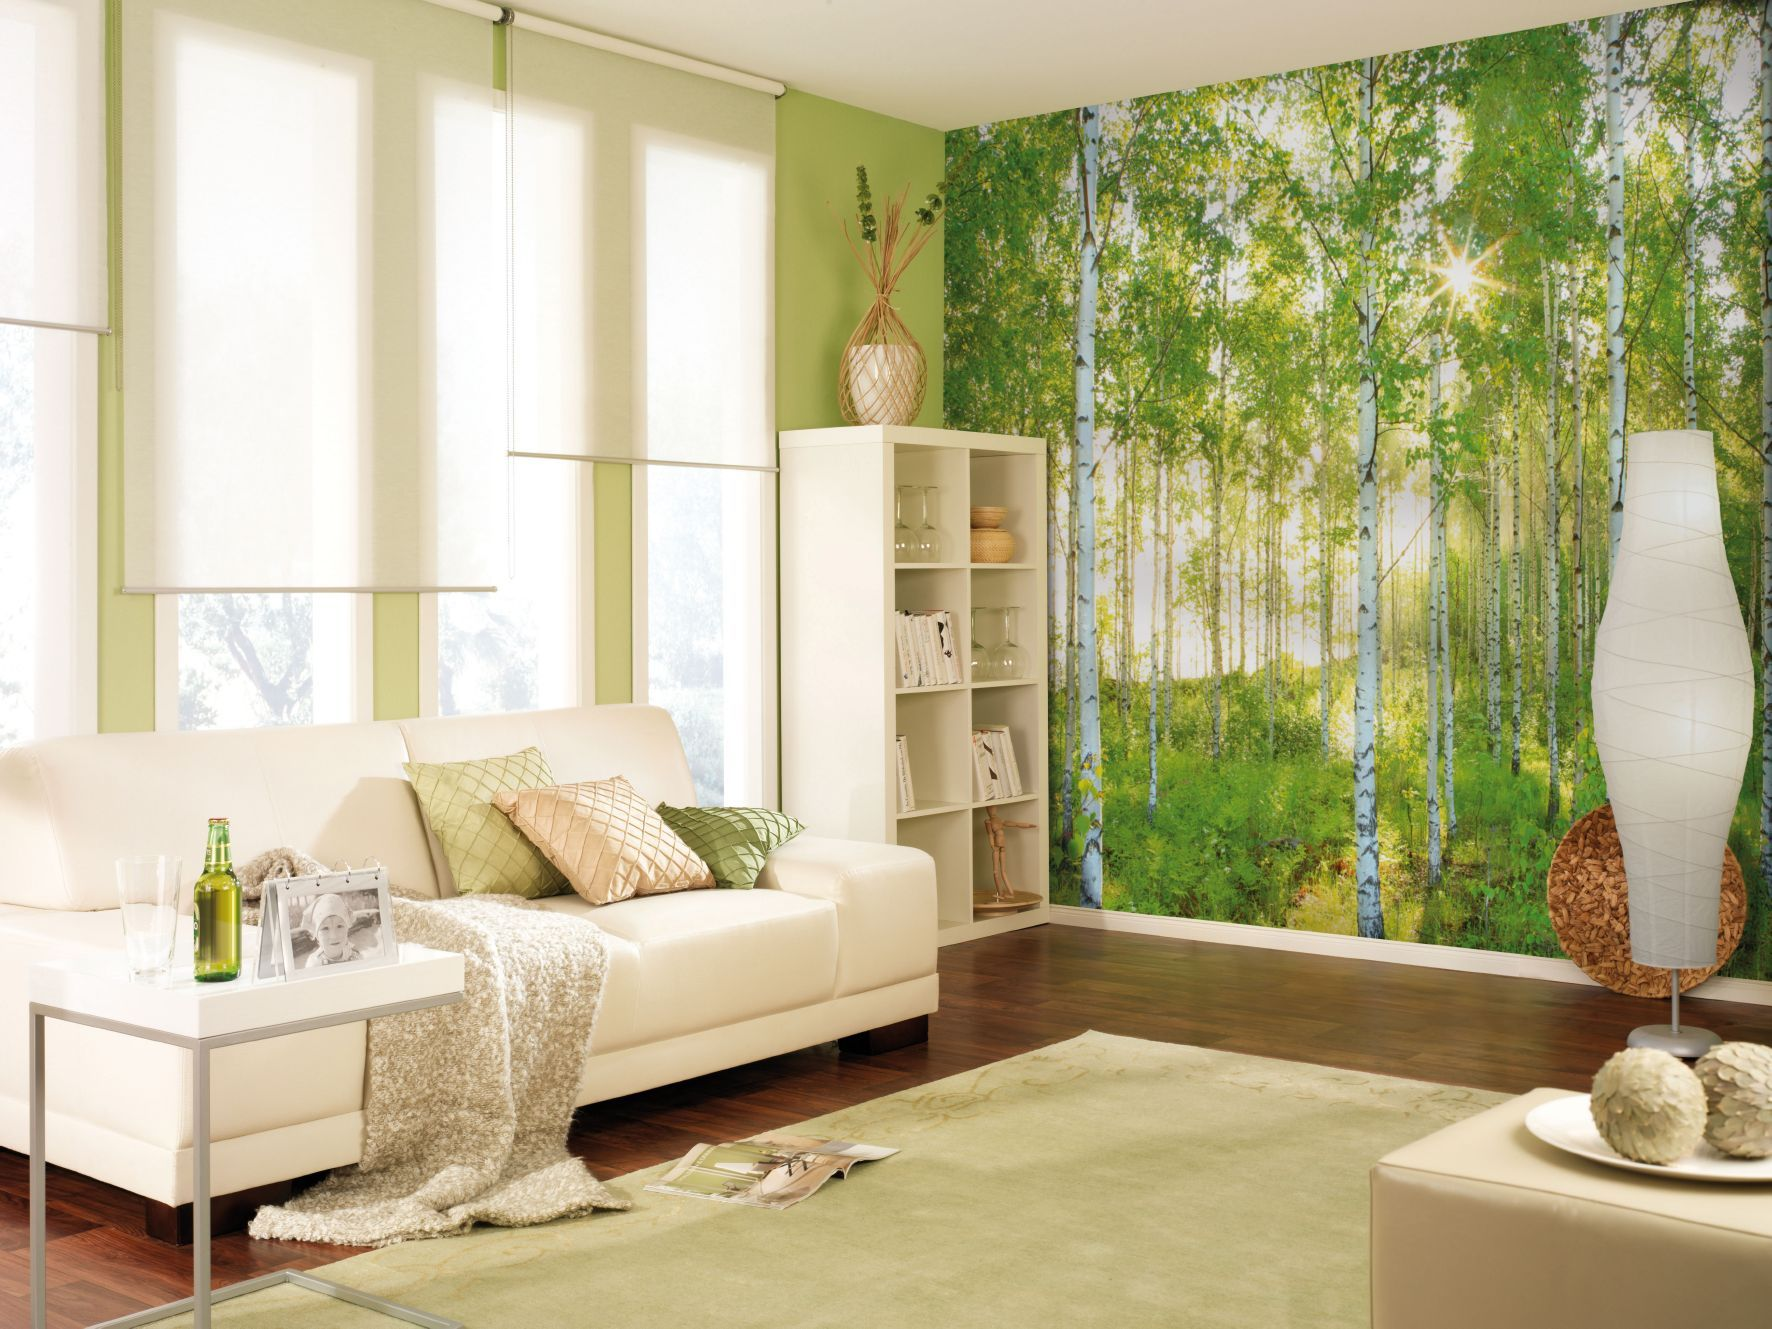 фотообои лес интернет магазин таблице